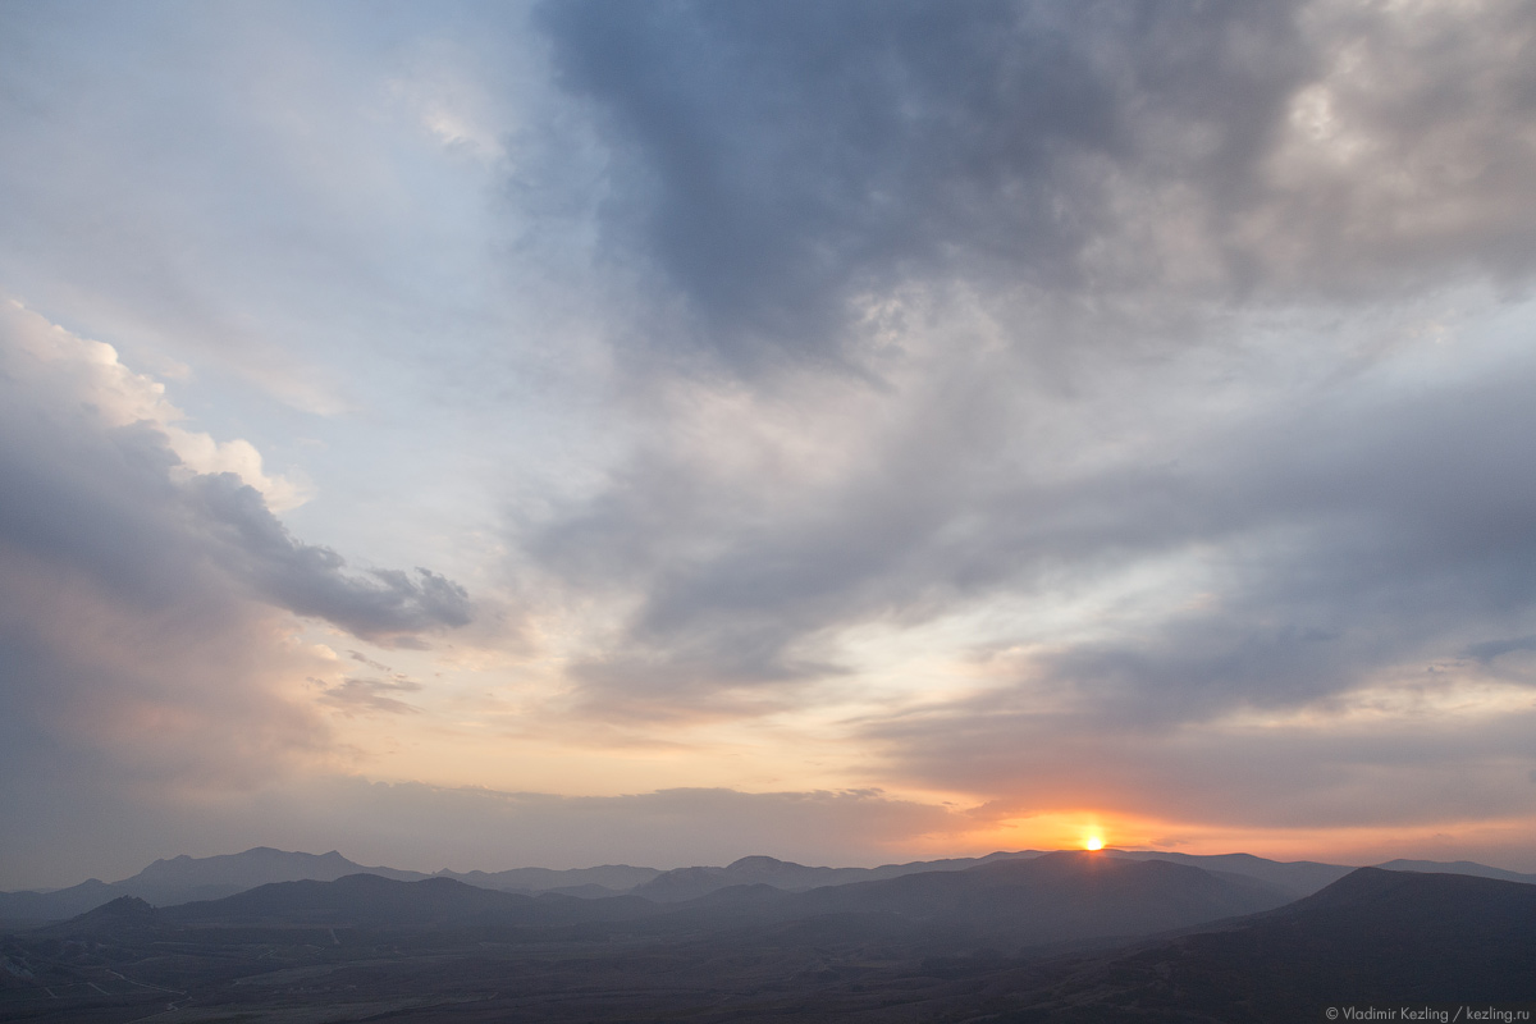 И снова Крым. Планета Коктебель: «Звездопад воспоминаний» на закате